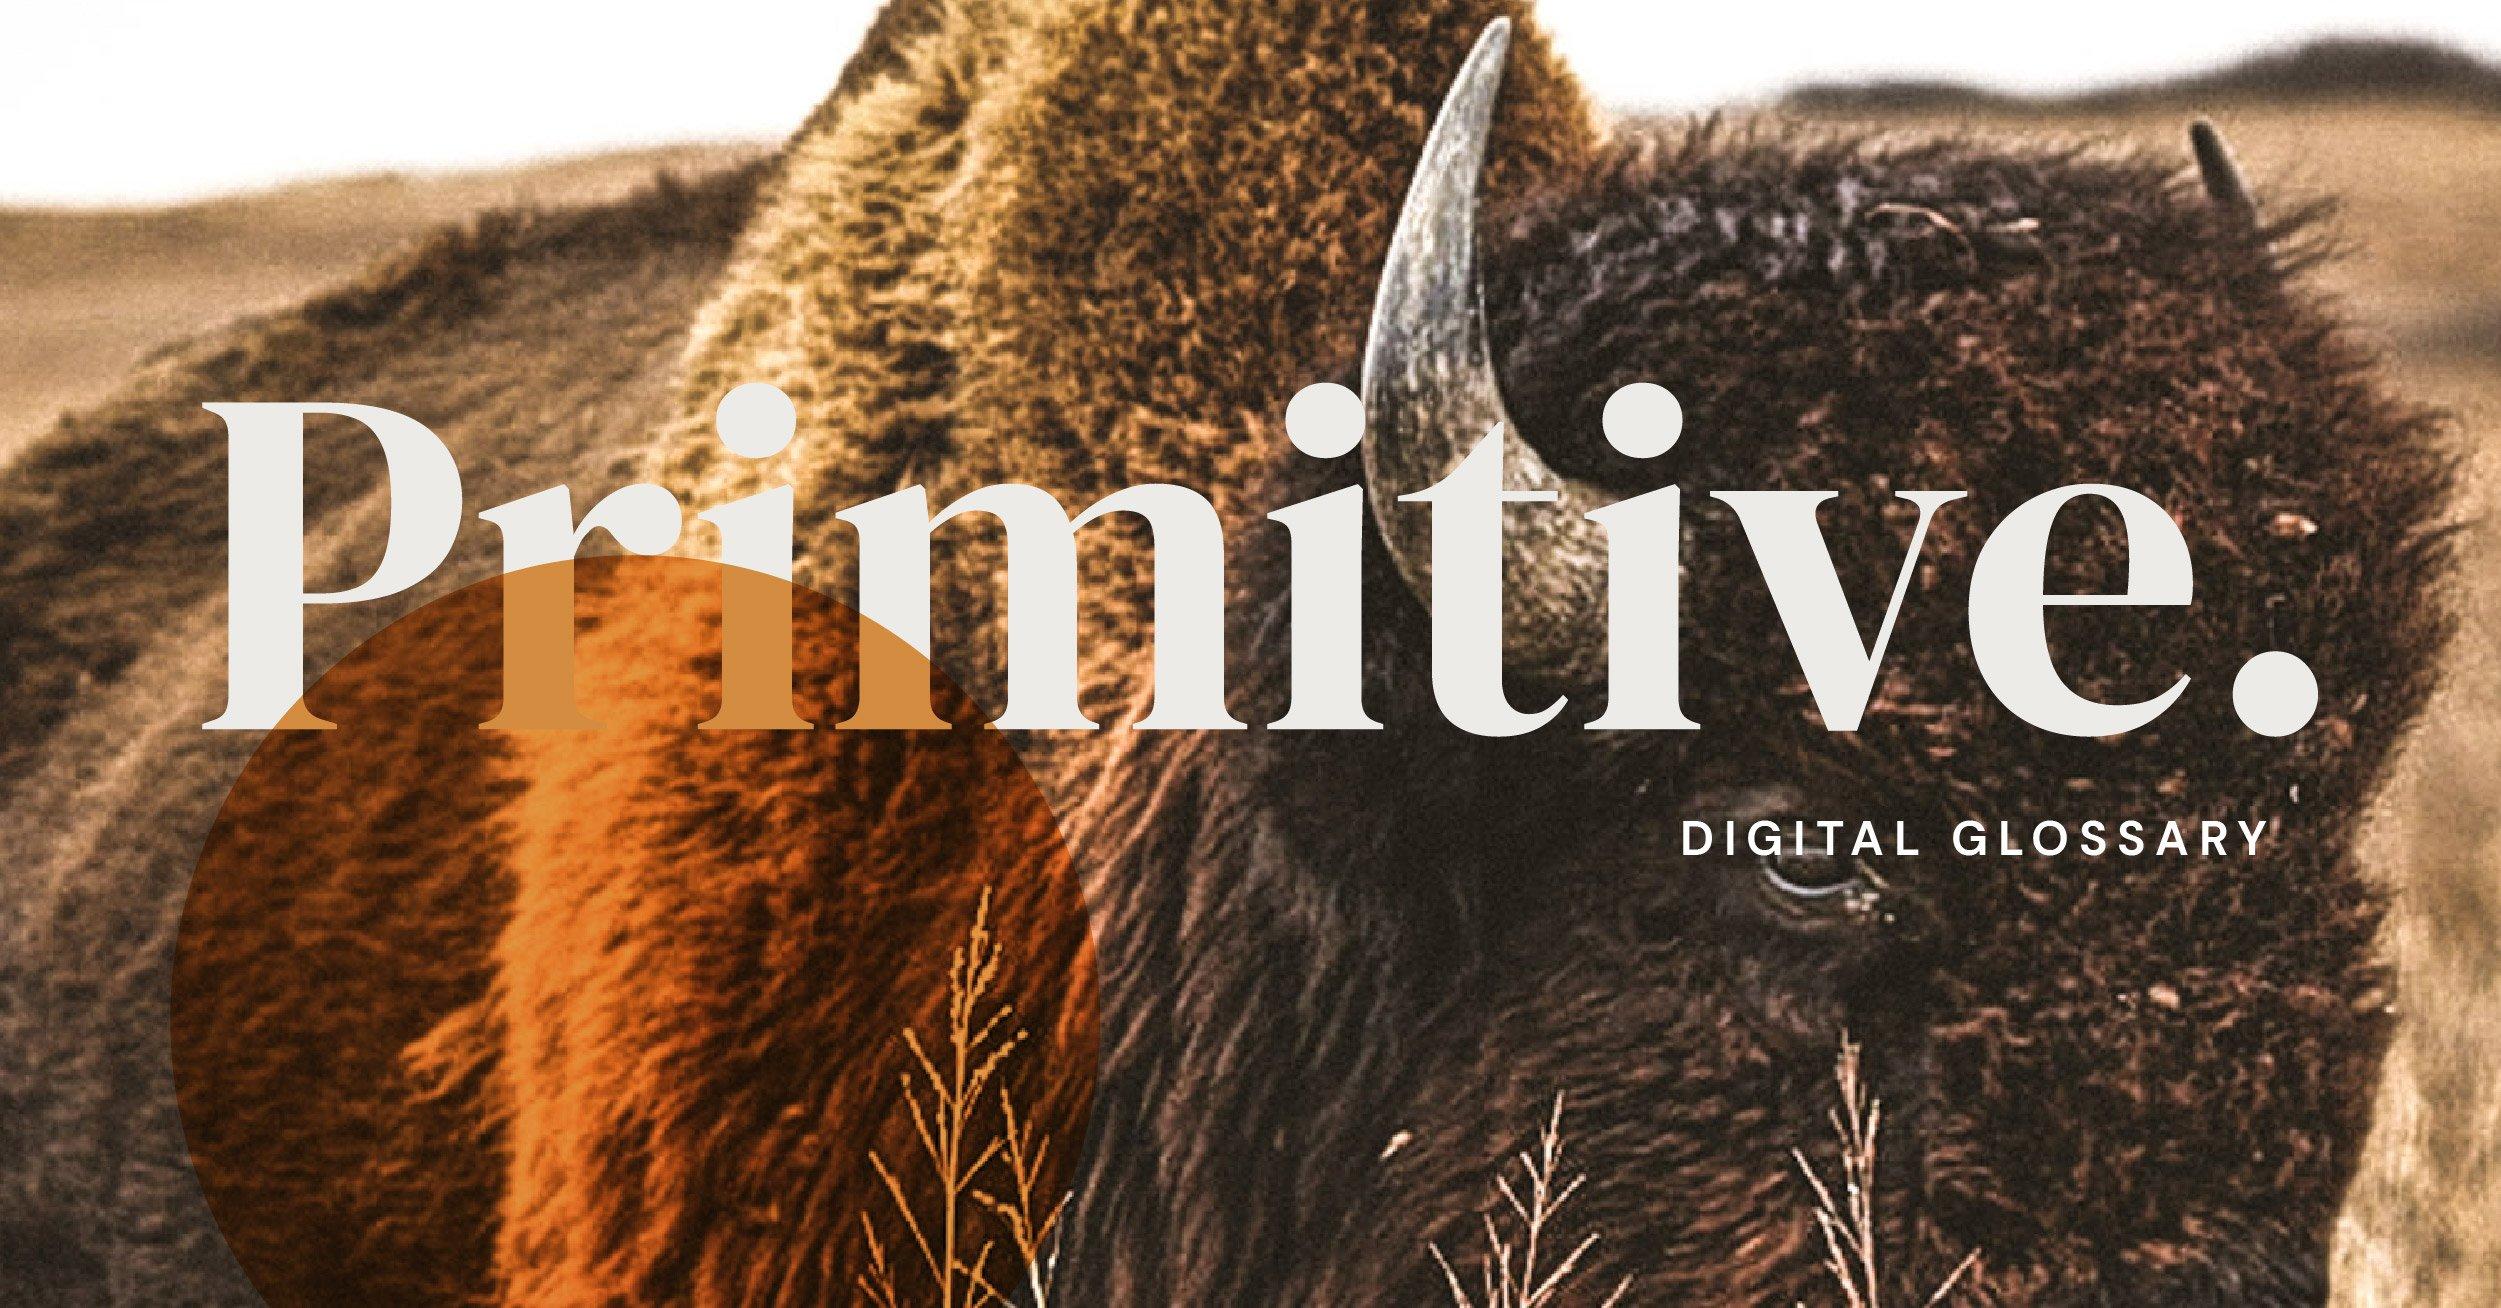 primitive's digital glossary